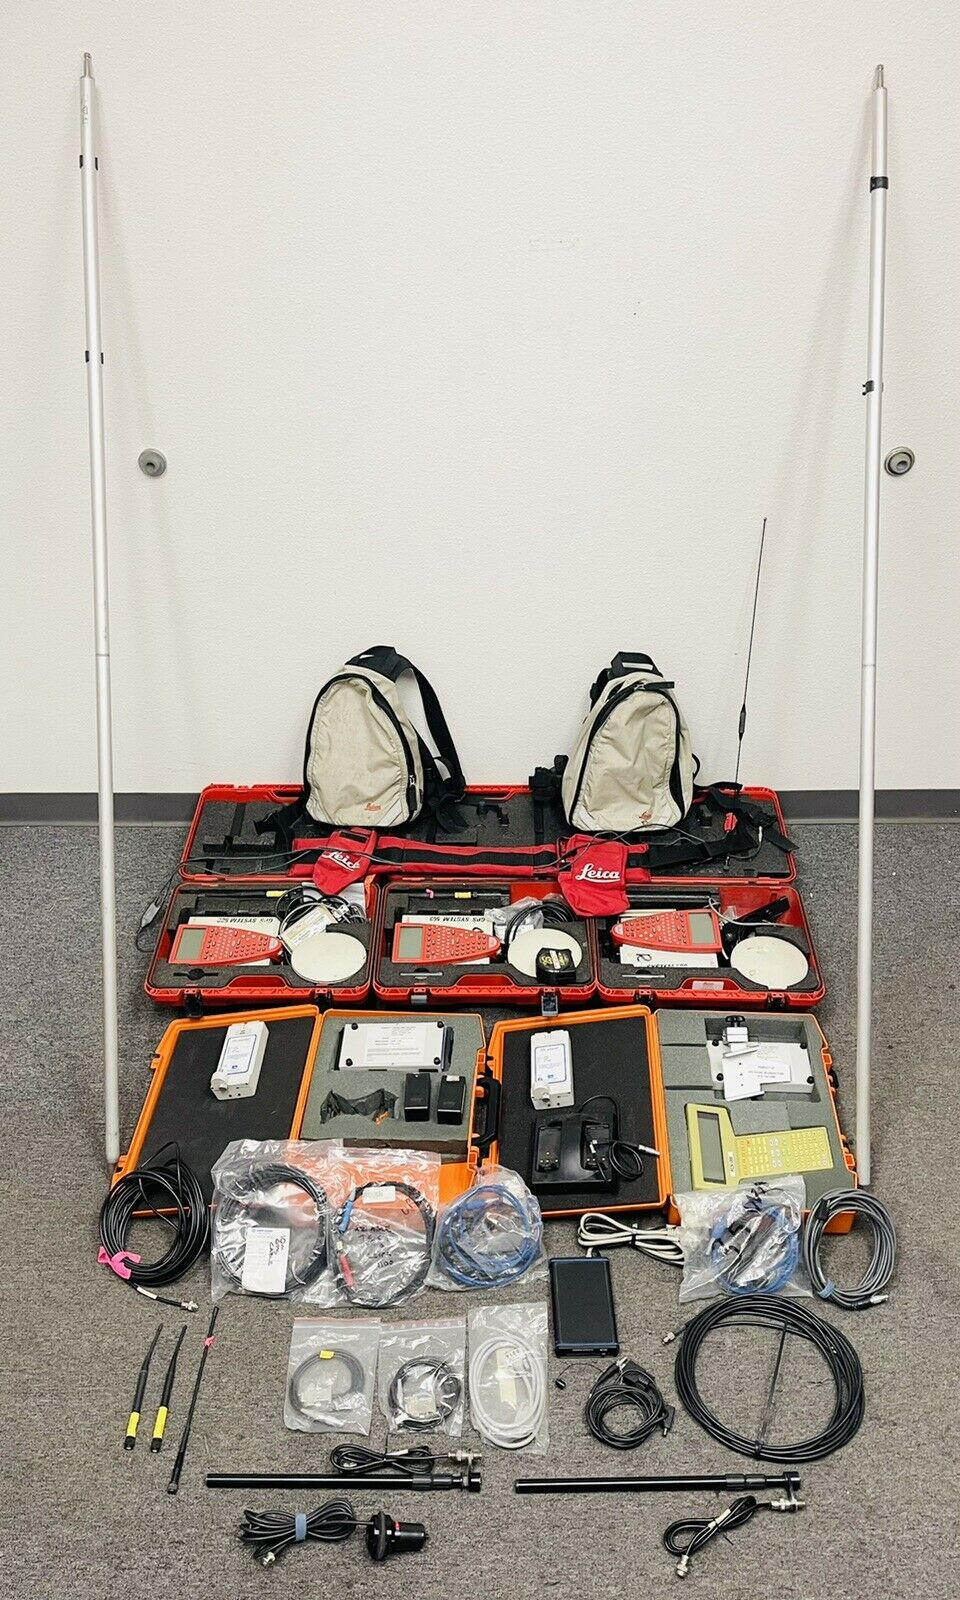 Lot of Leica Survey GPS System 500 RCS1000 PDL4535 Radio & More READ DESCRIPTION